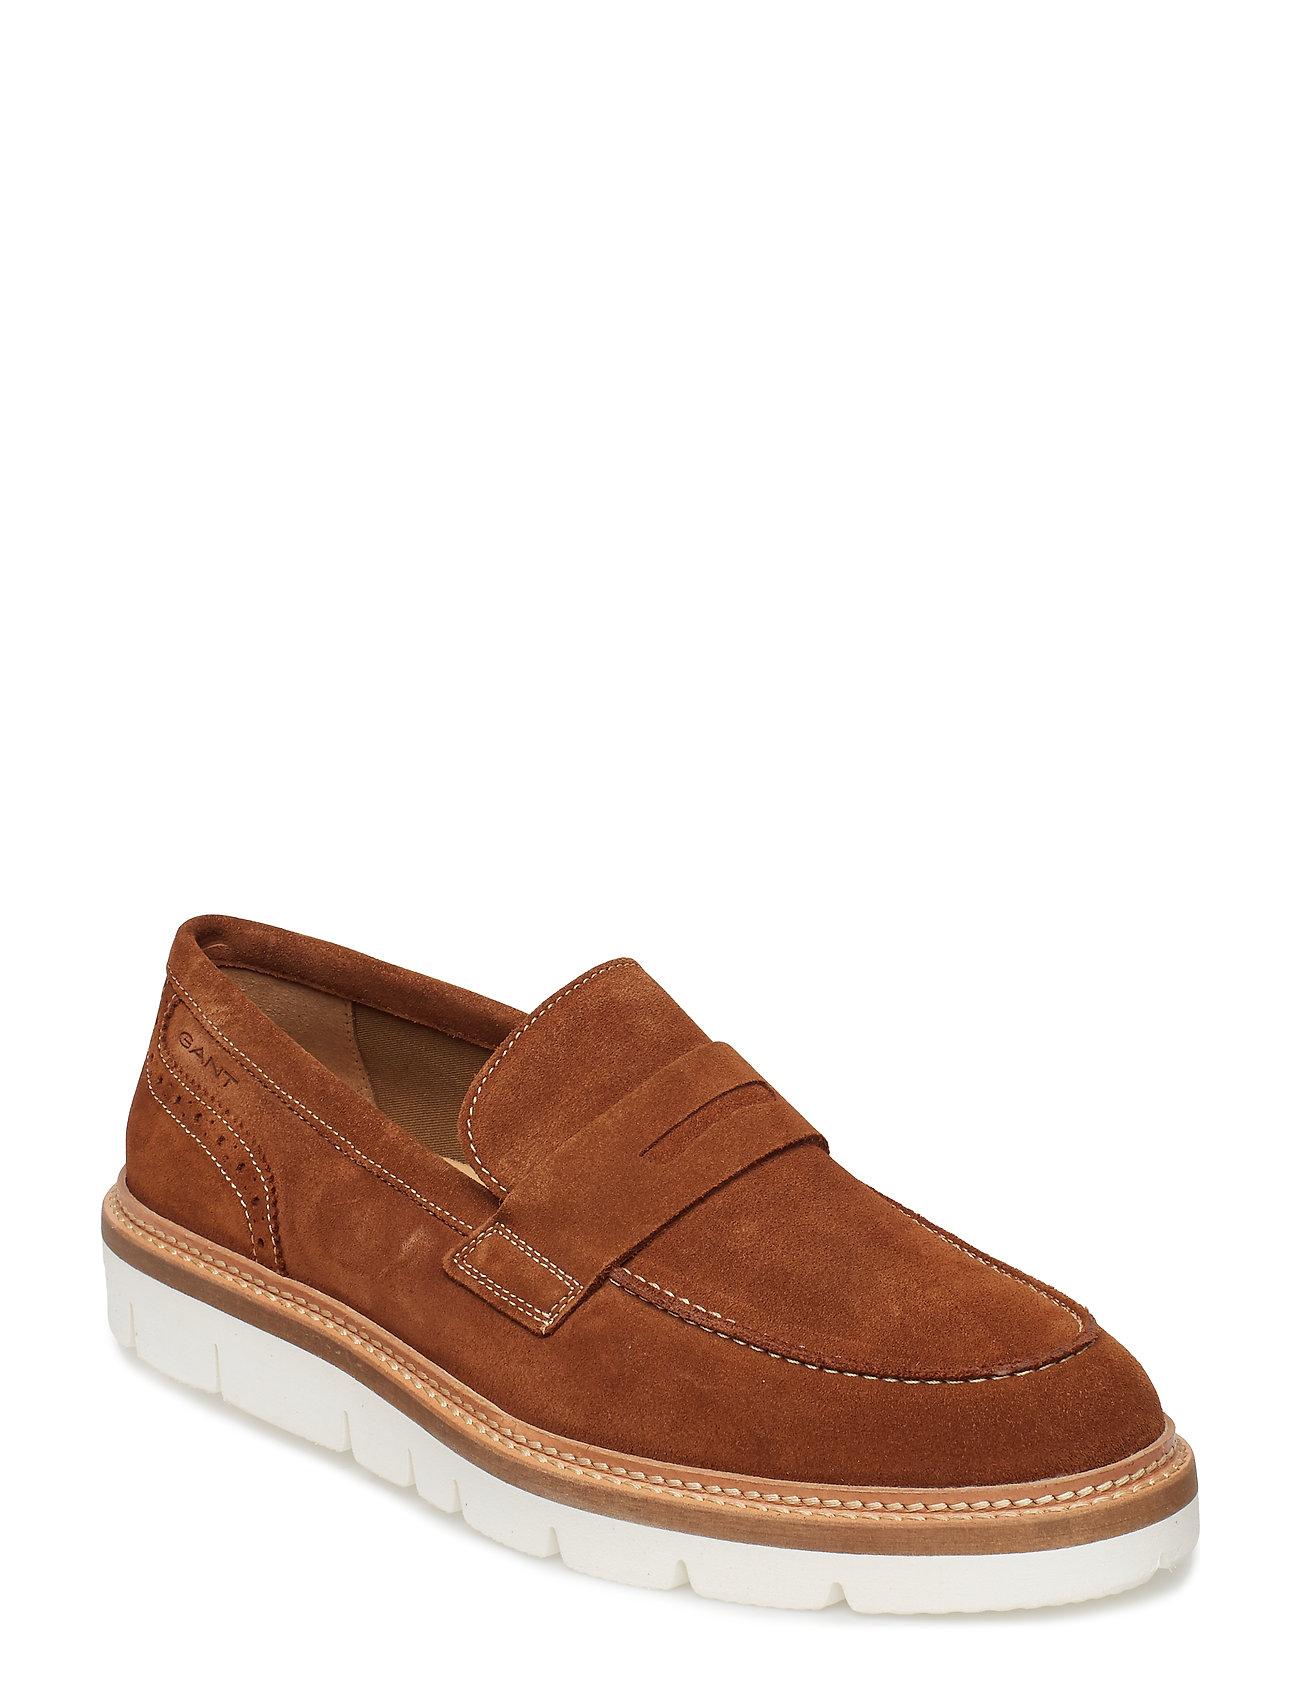 GANT Yuko Slip-On Shoes Shoes Business Loafers Braun GANT